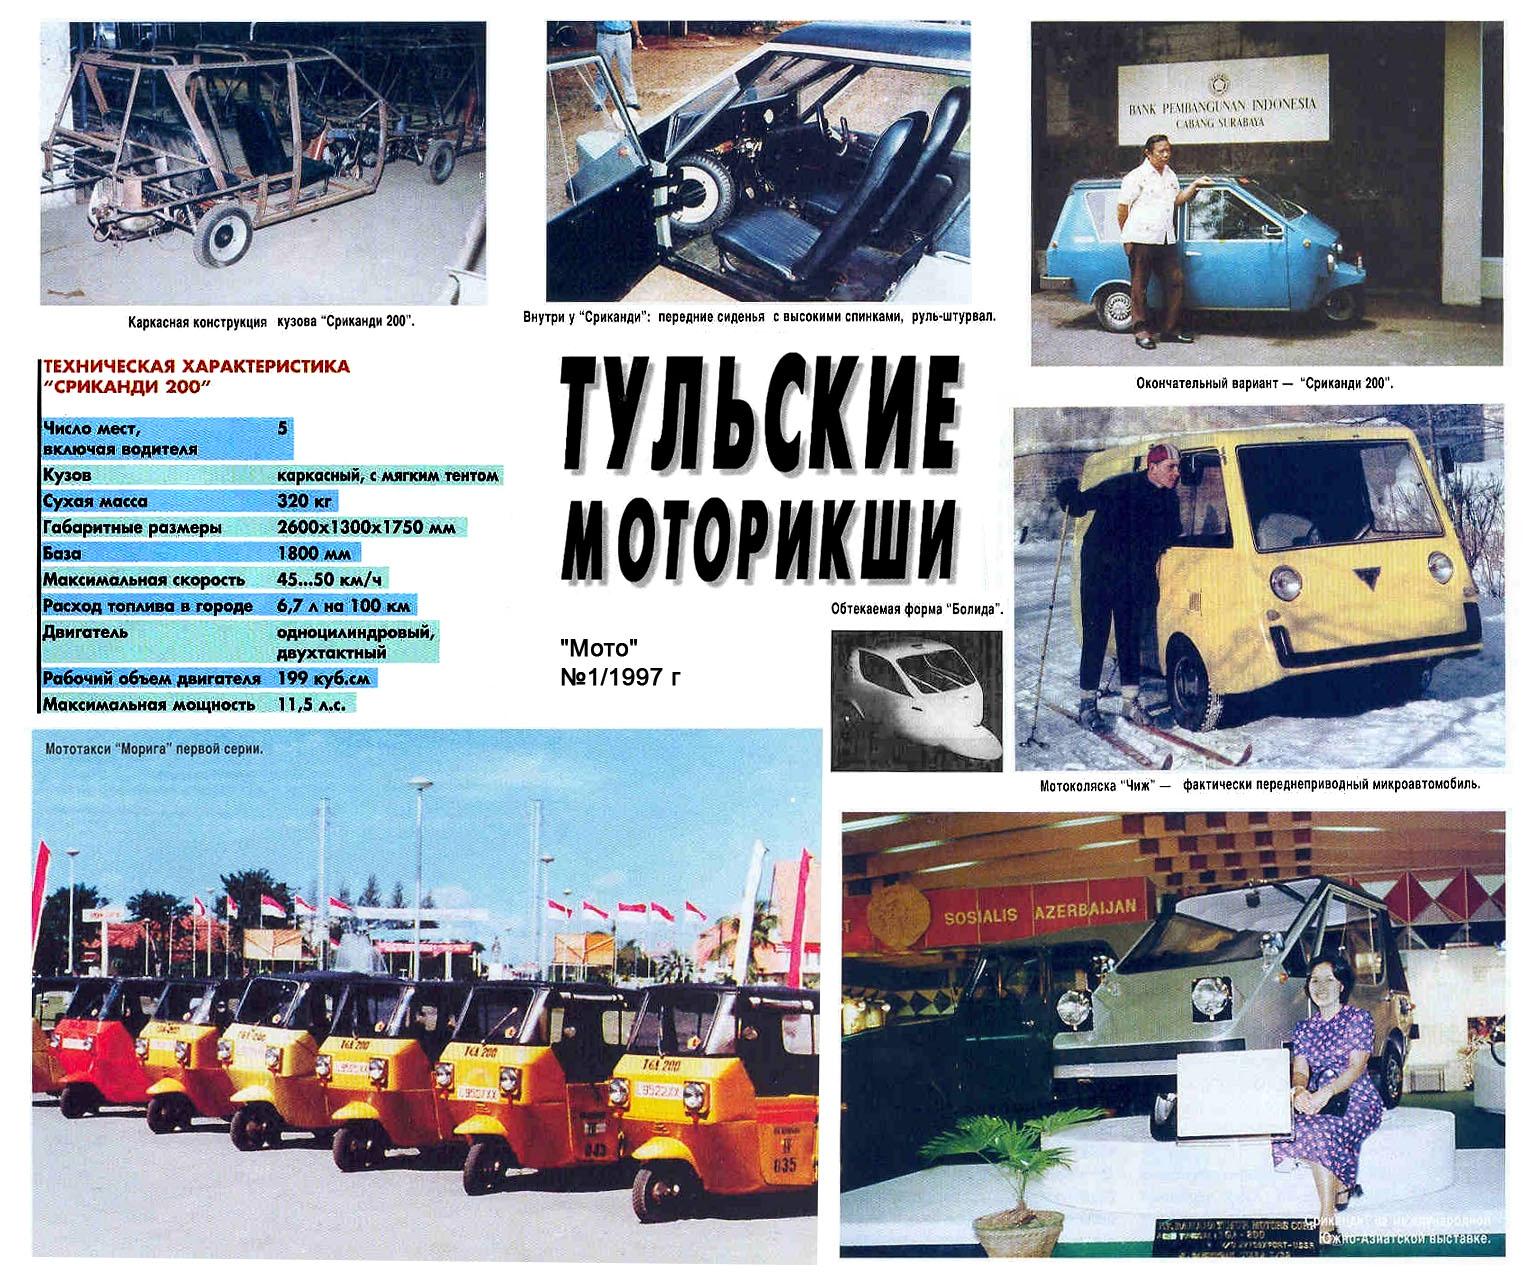 http://ic.pics.livejournal.com/sstoyan/25436415/44085/44085_original.jpg